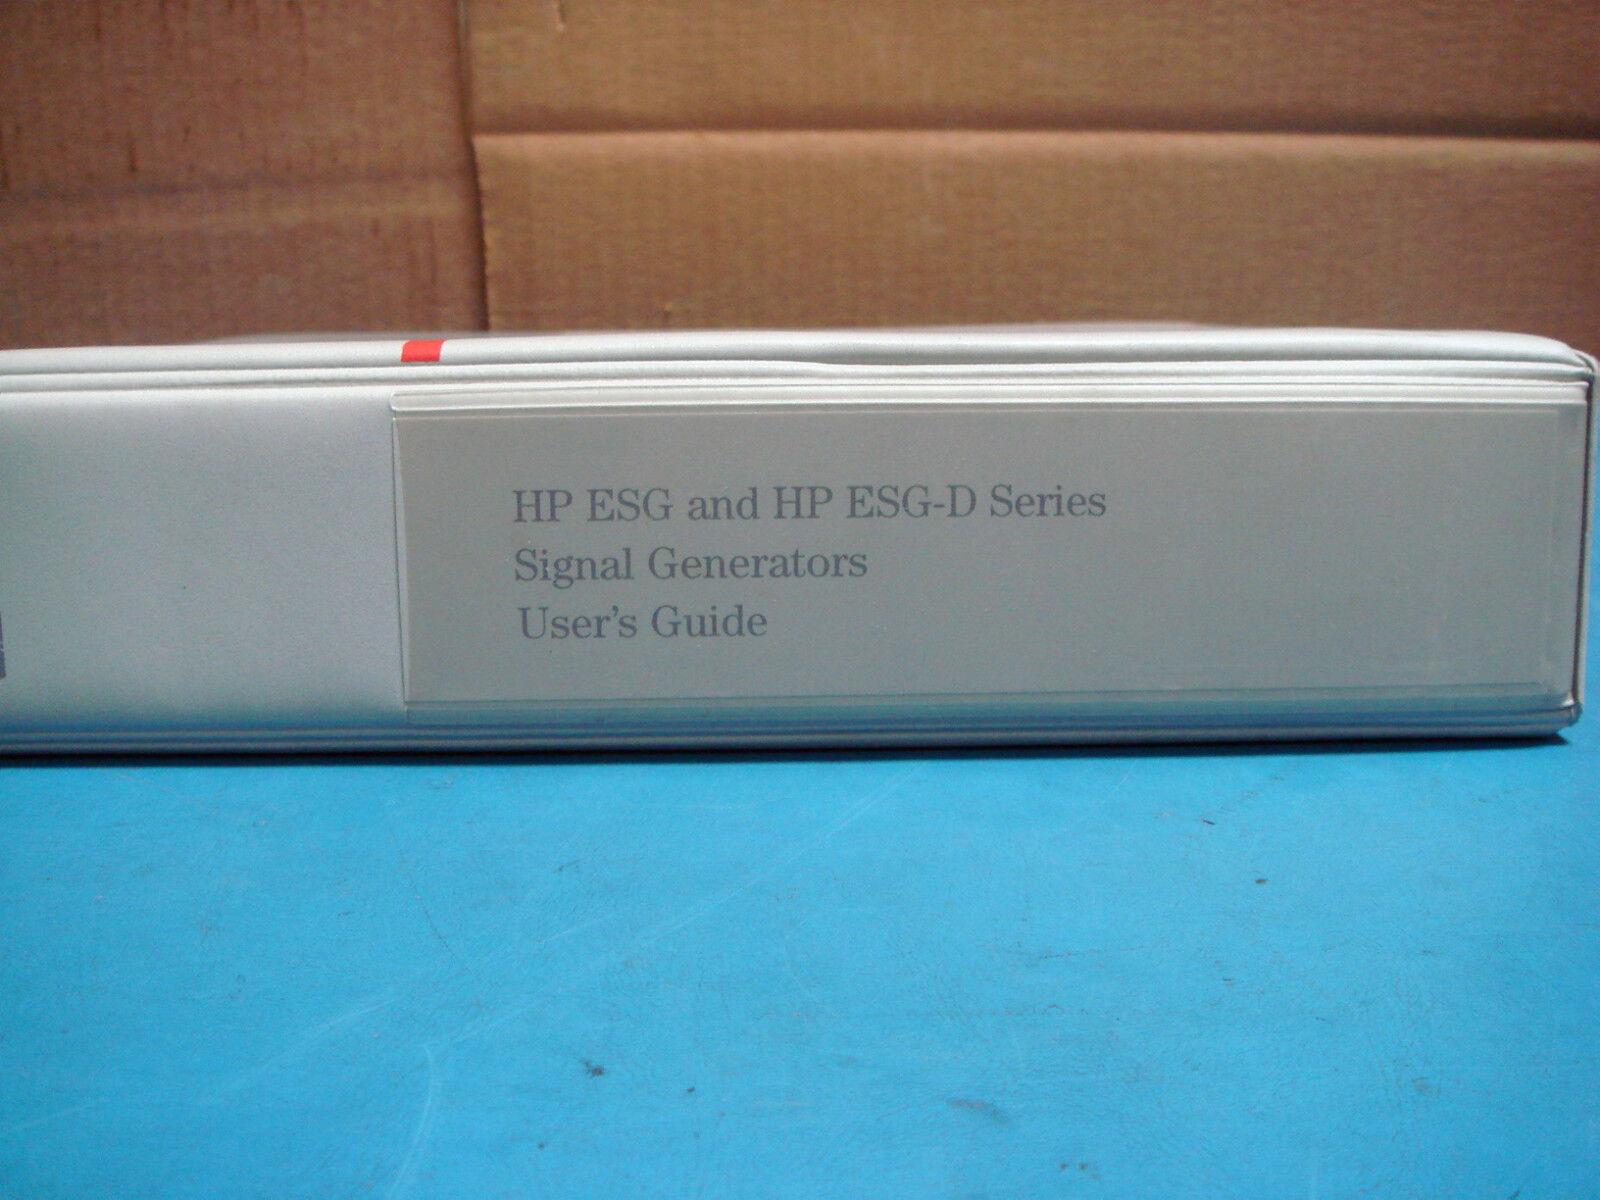 HP ESG AND HP ESG-D SERIES SIGNAL GENERATORS USERS GUIDE